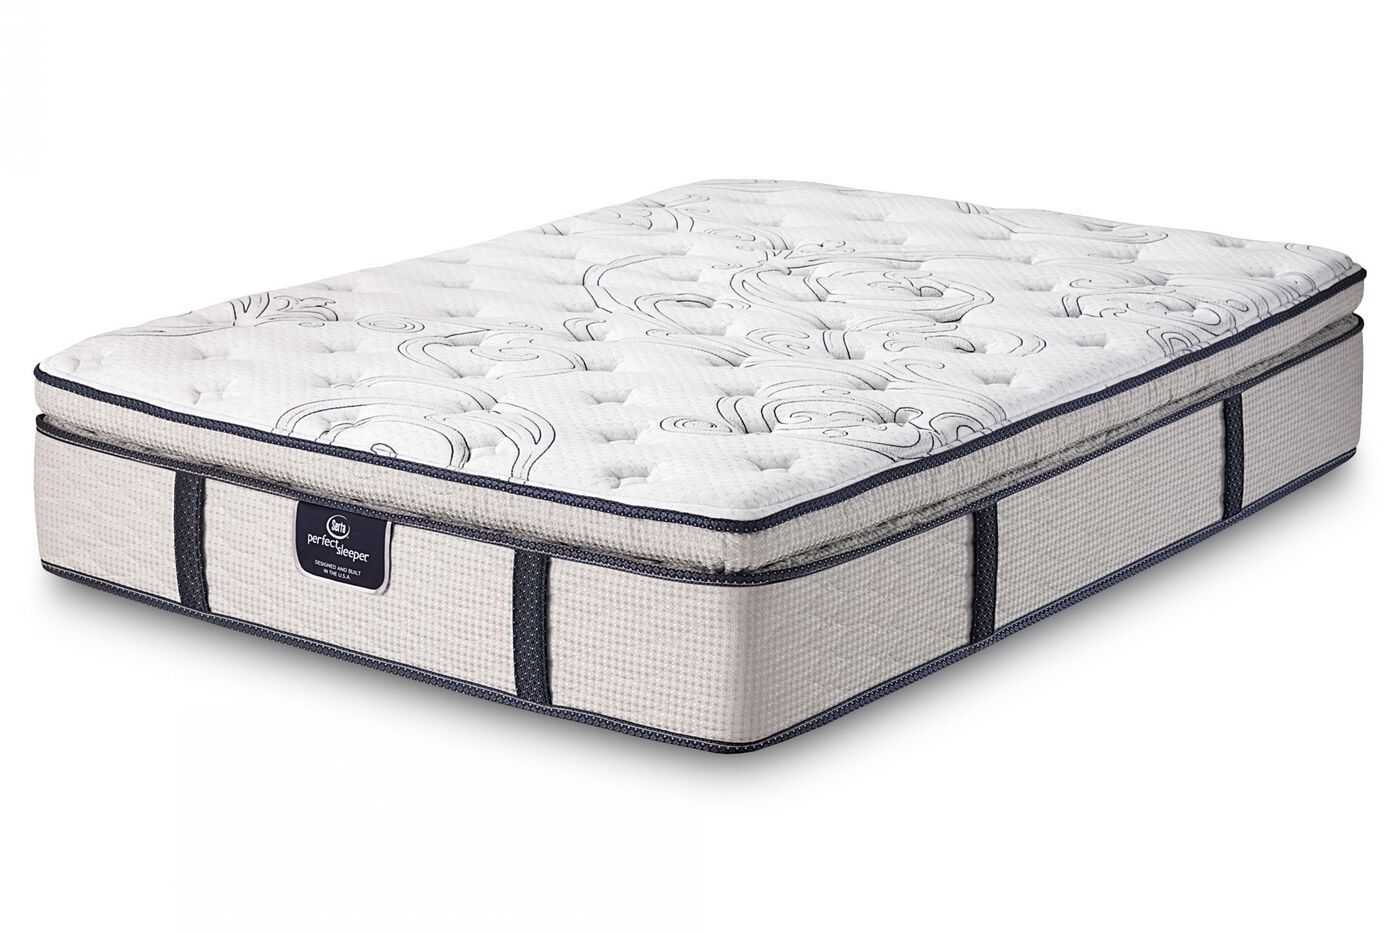 Serta Perfect Sleeper Grand Sky Plush Mattress